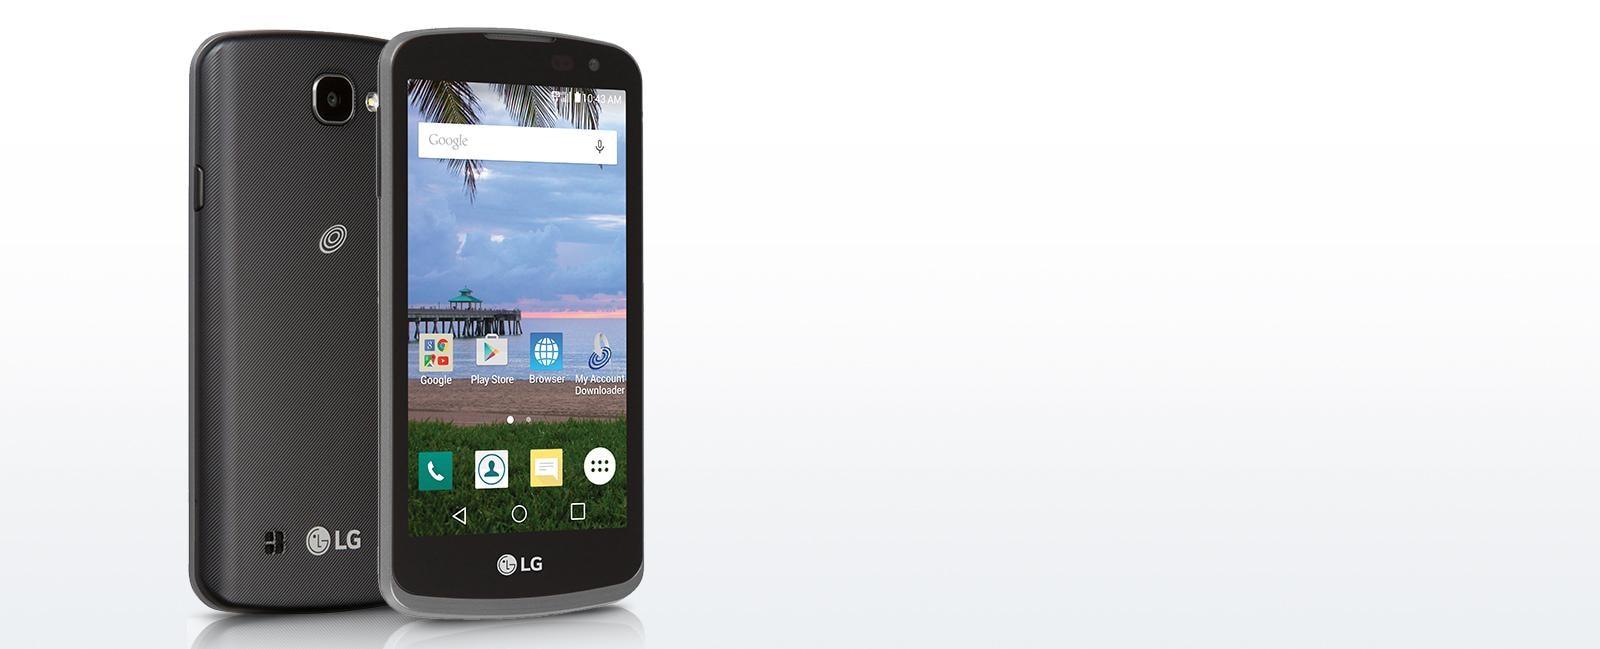 LG Rebel LTE (GSM) TracFone Smartphone (L43AL) | LG USA